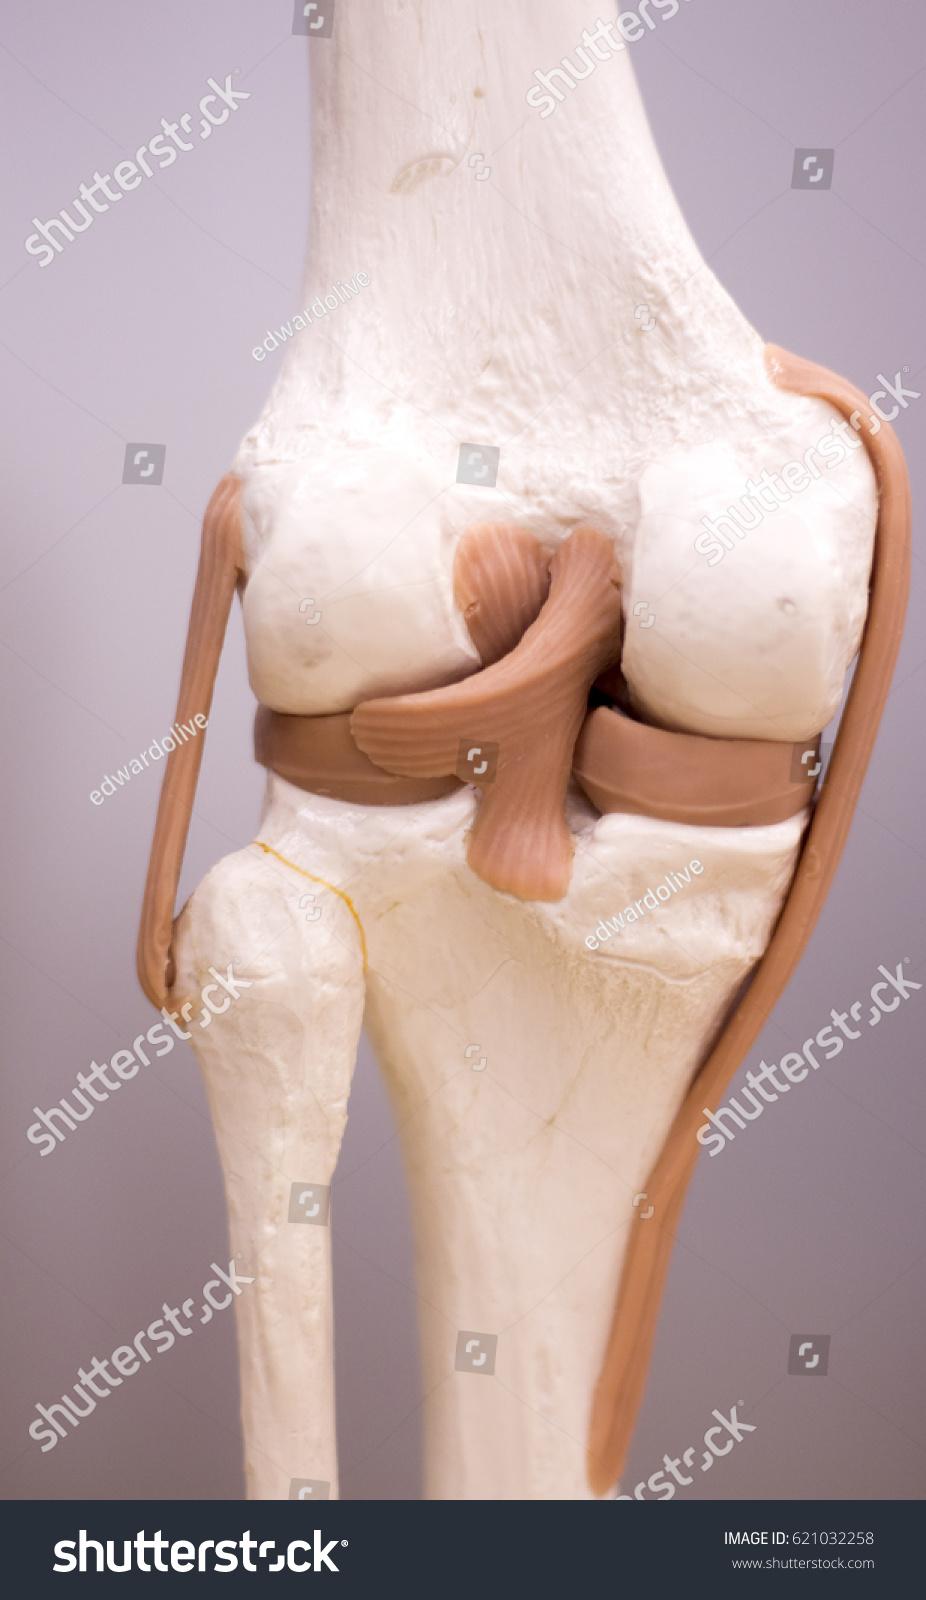 Knee Meniscus Medical Study Student Anatomy Stock Photo (Edit Now ...